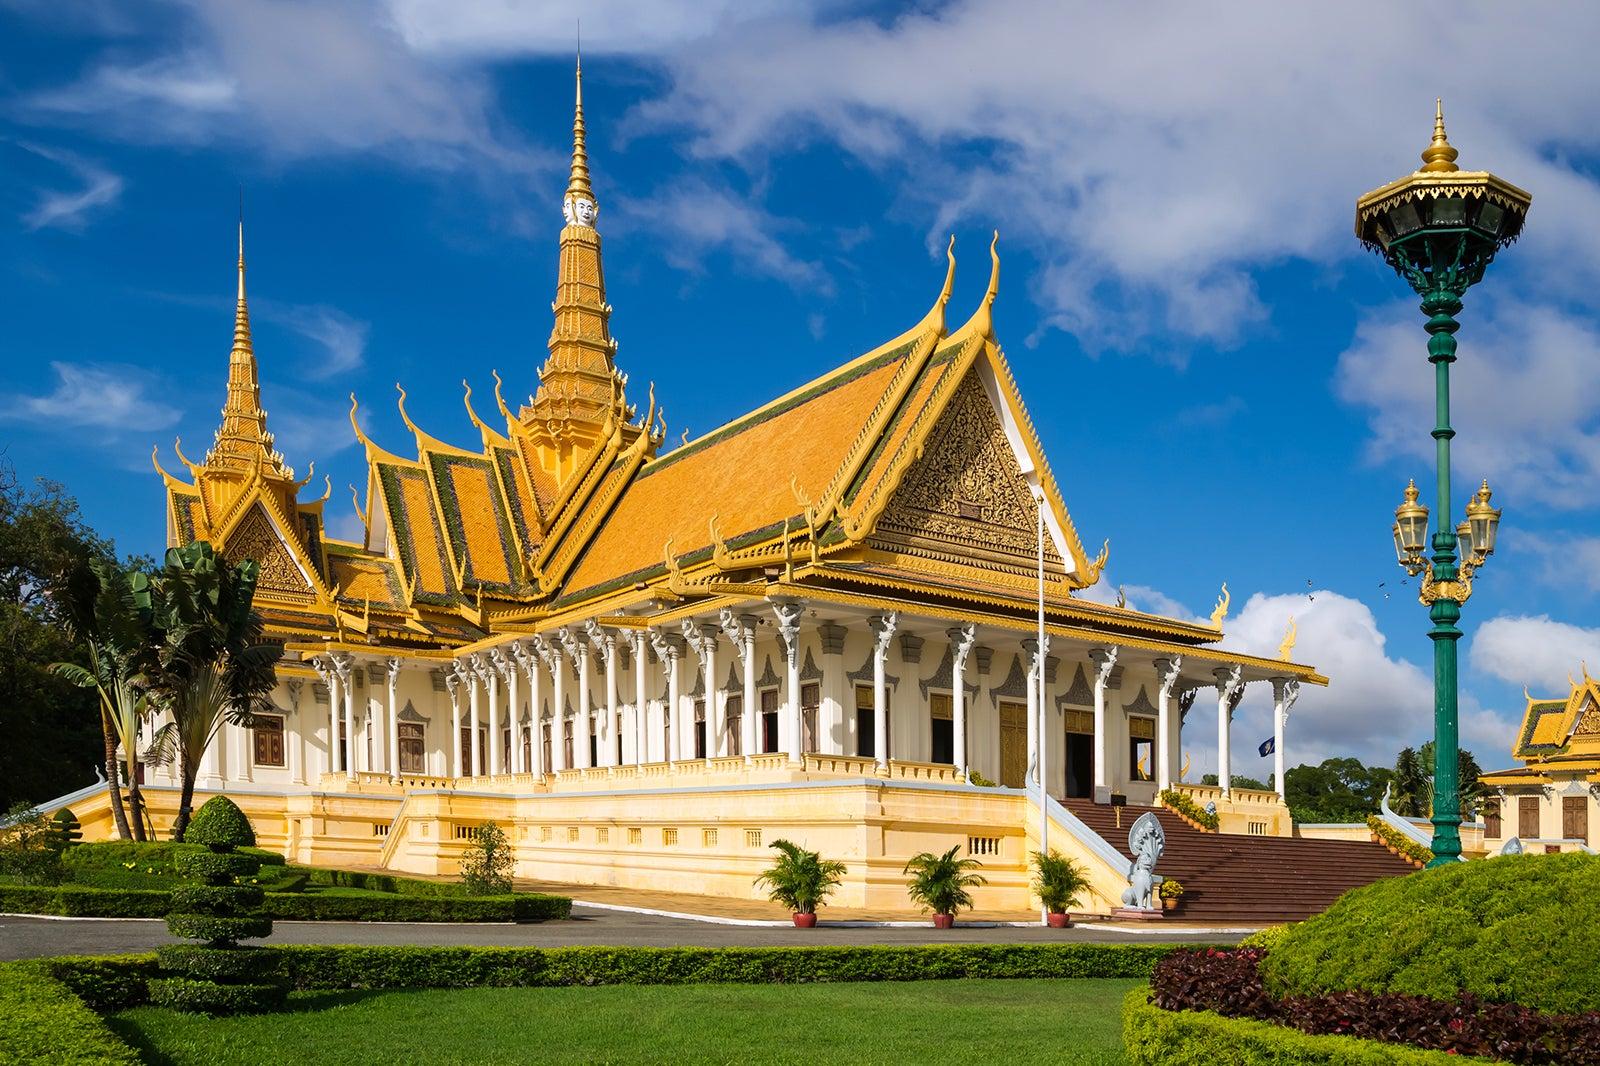 Phnom Penh Royal Palace and Silver Pagoda - Residence of the ...